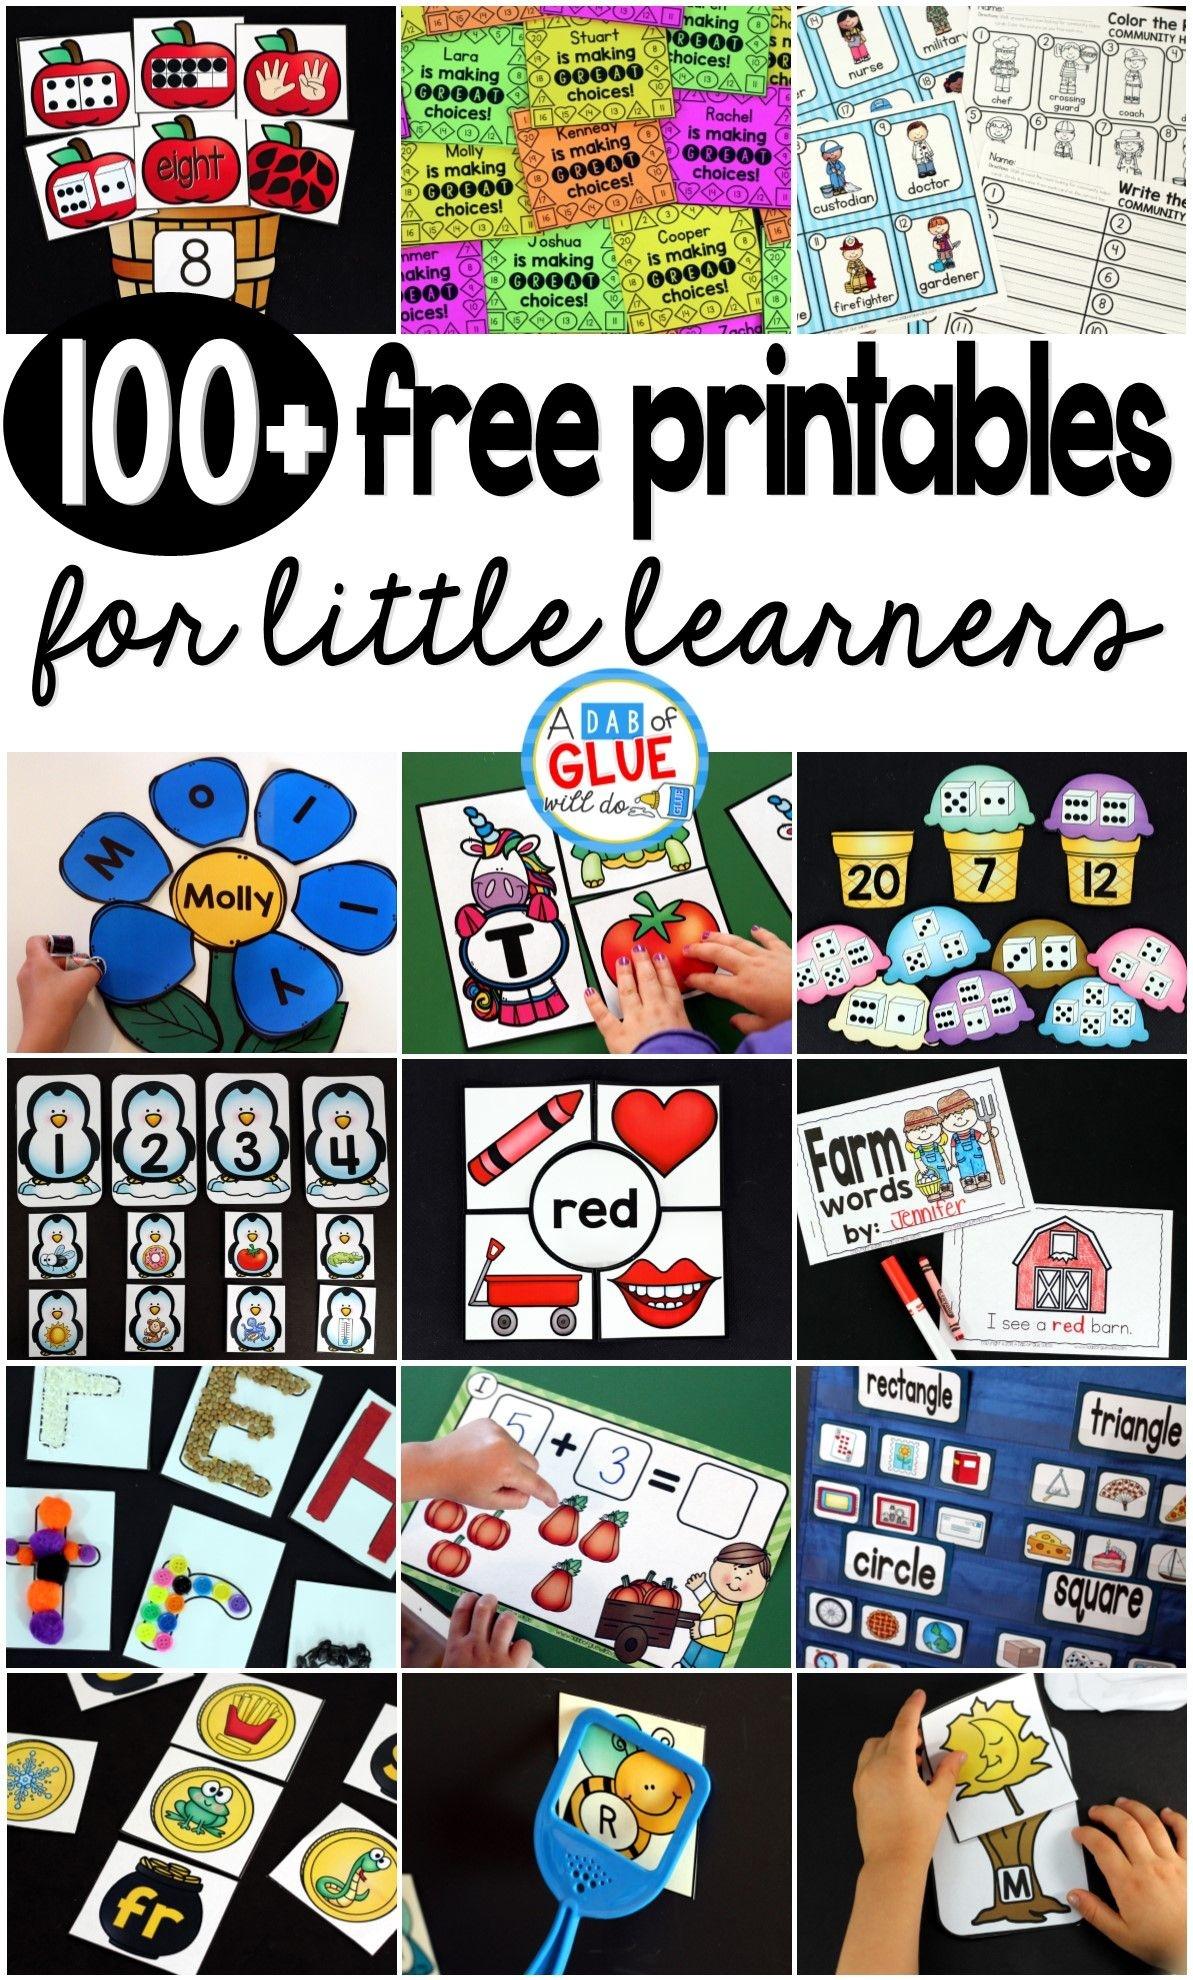 Free Printables | A Dab Of Glue Will Do Blog | Free Teaching - Free Printable Preschool Teacher Resources